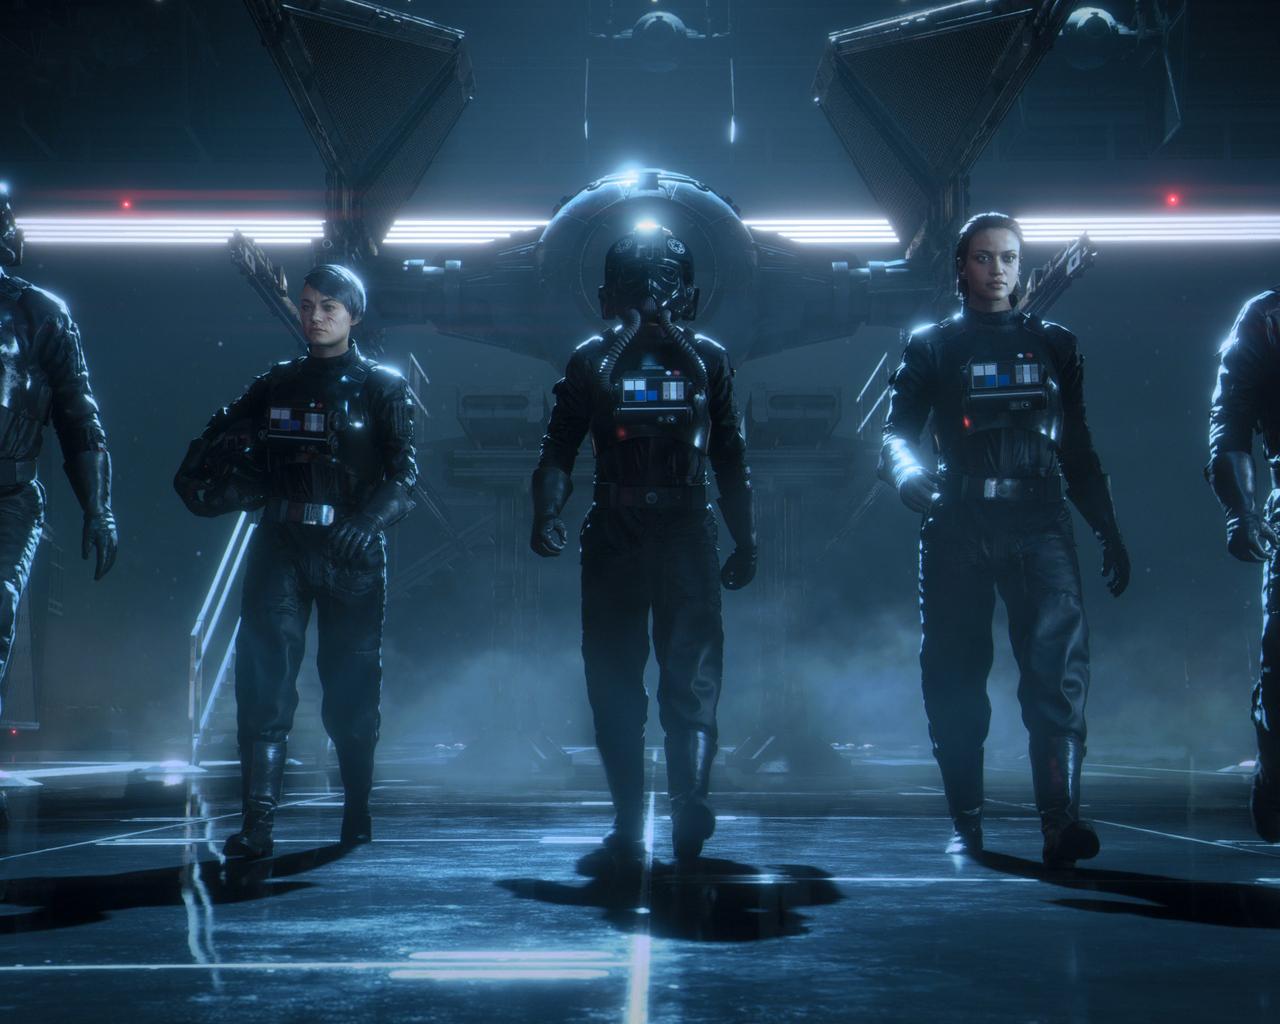 star-wars-squadrons-2021-4k-9g.jpg